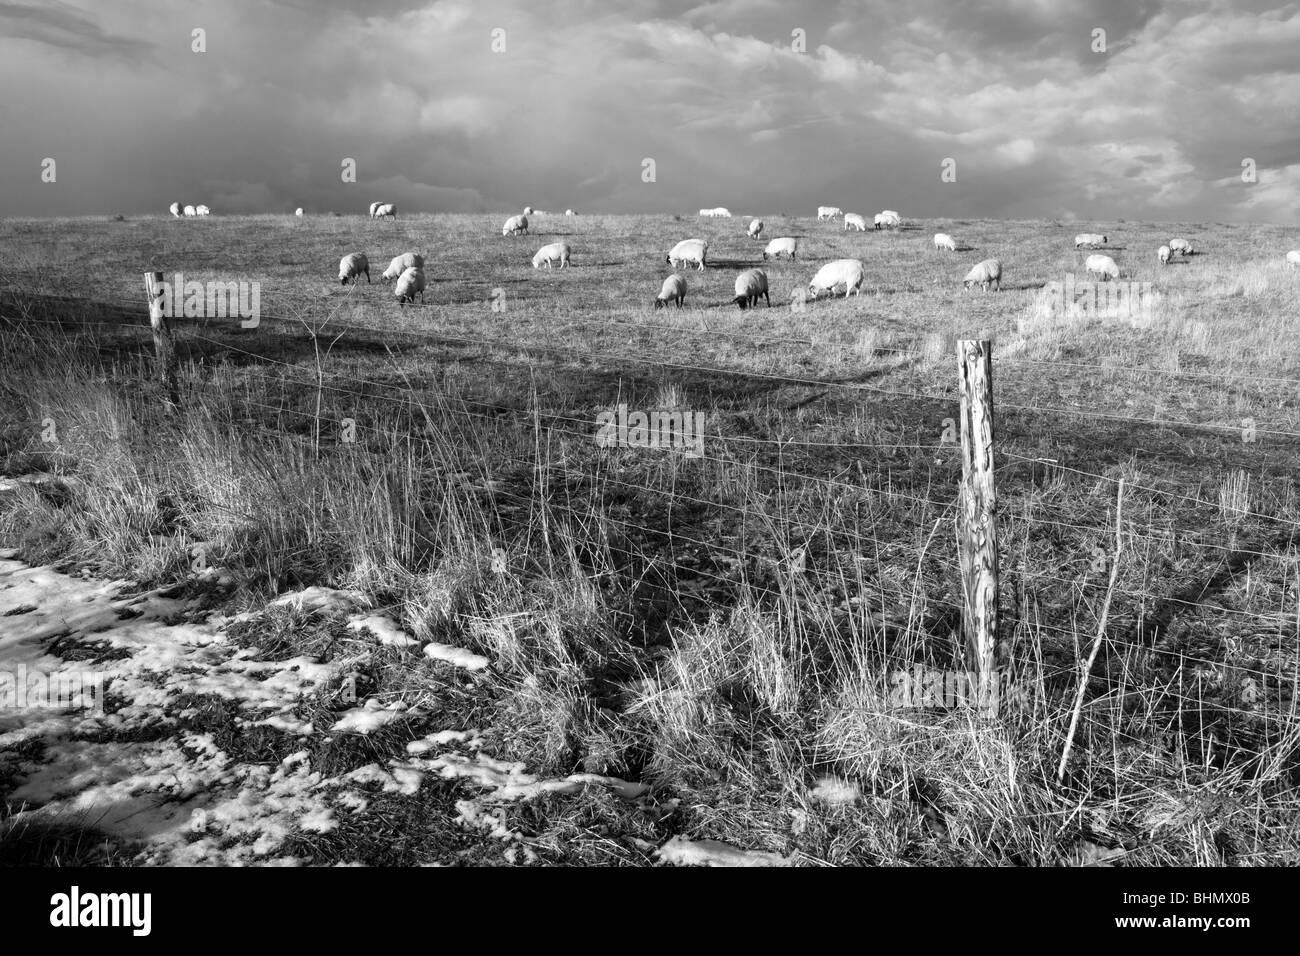 Sheep in Winter Field - Stock Image